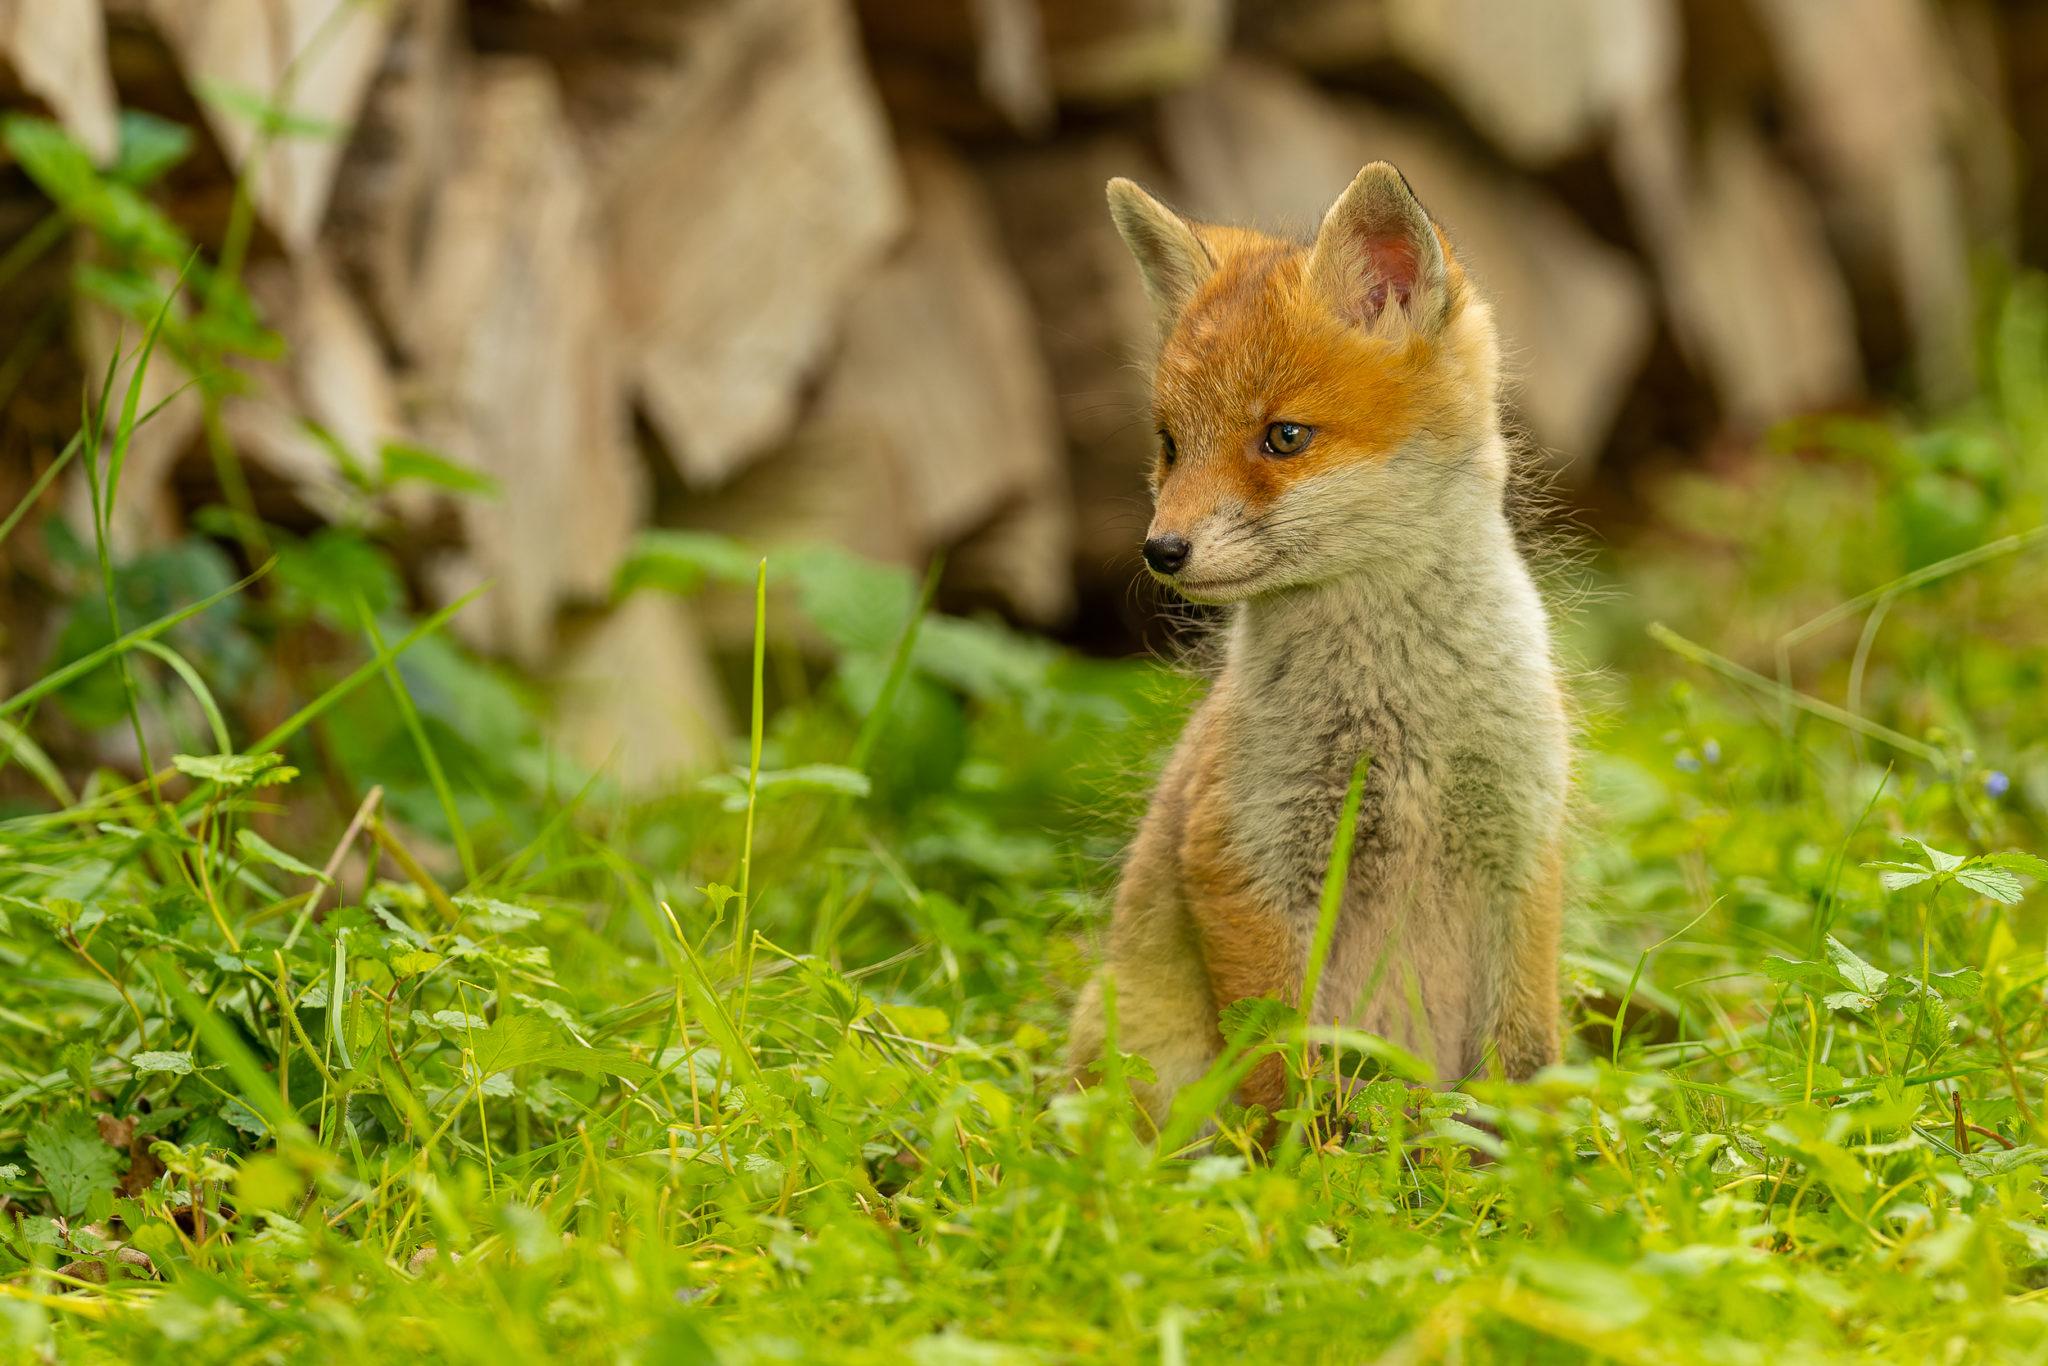 junge Füchse (vulpes vulpes), Naturfotografie Olaf & Sylvia Rentzsch